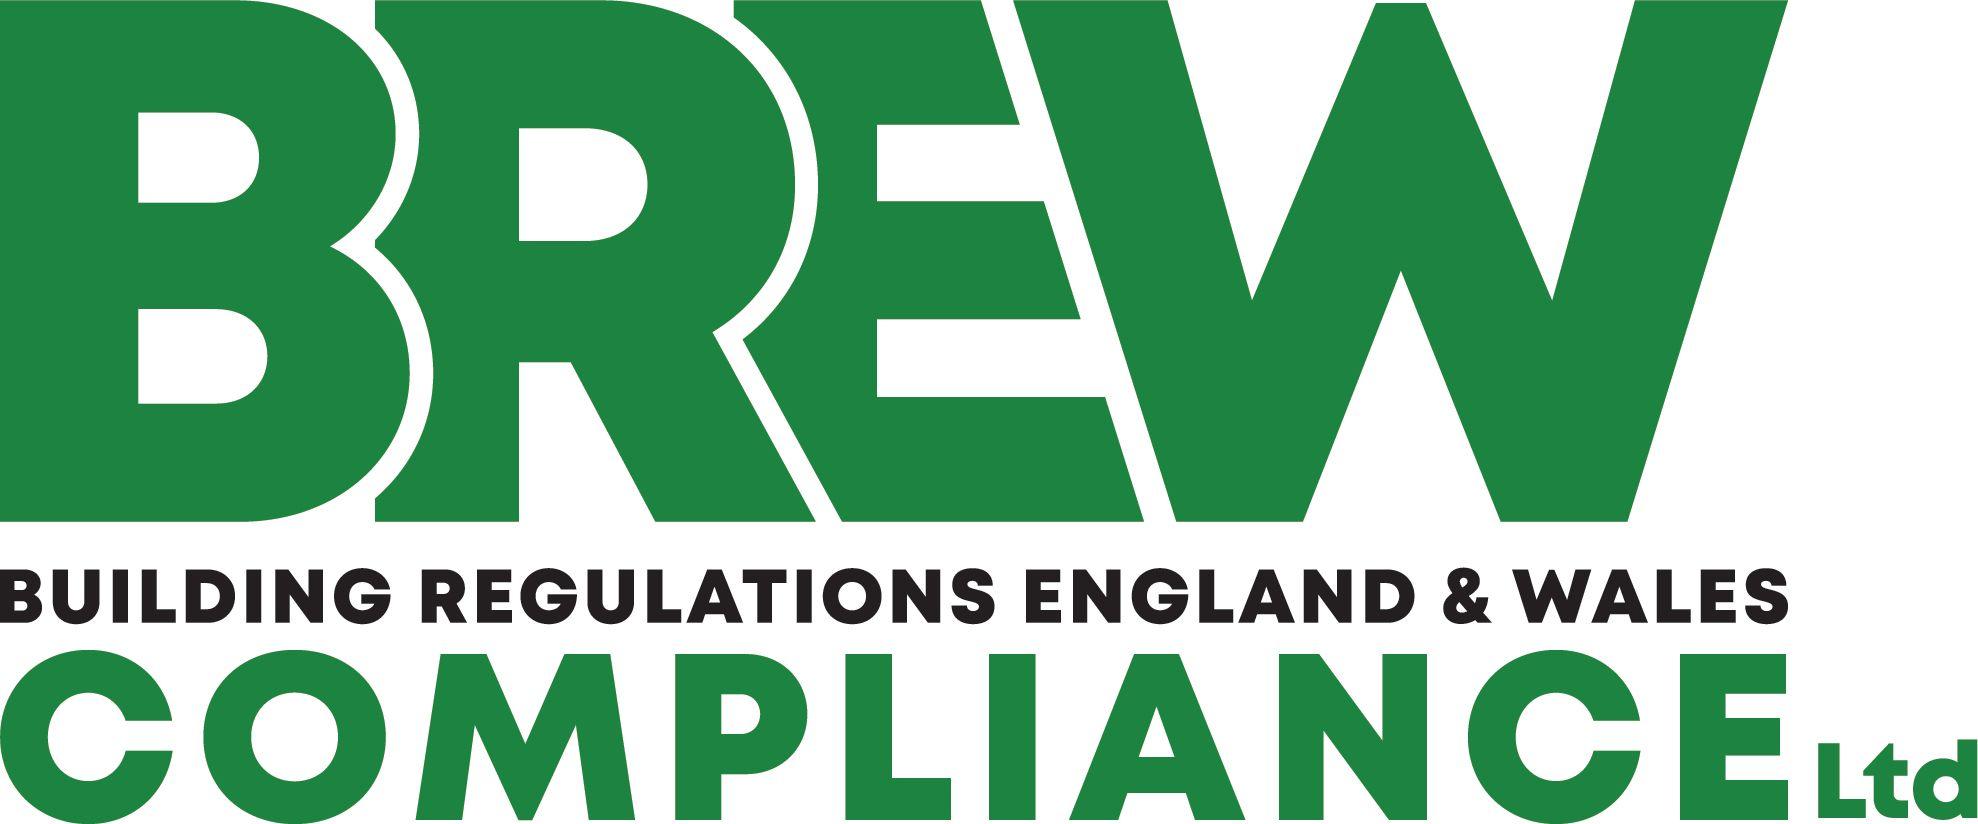 BREW Compliance Ltd